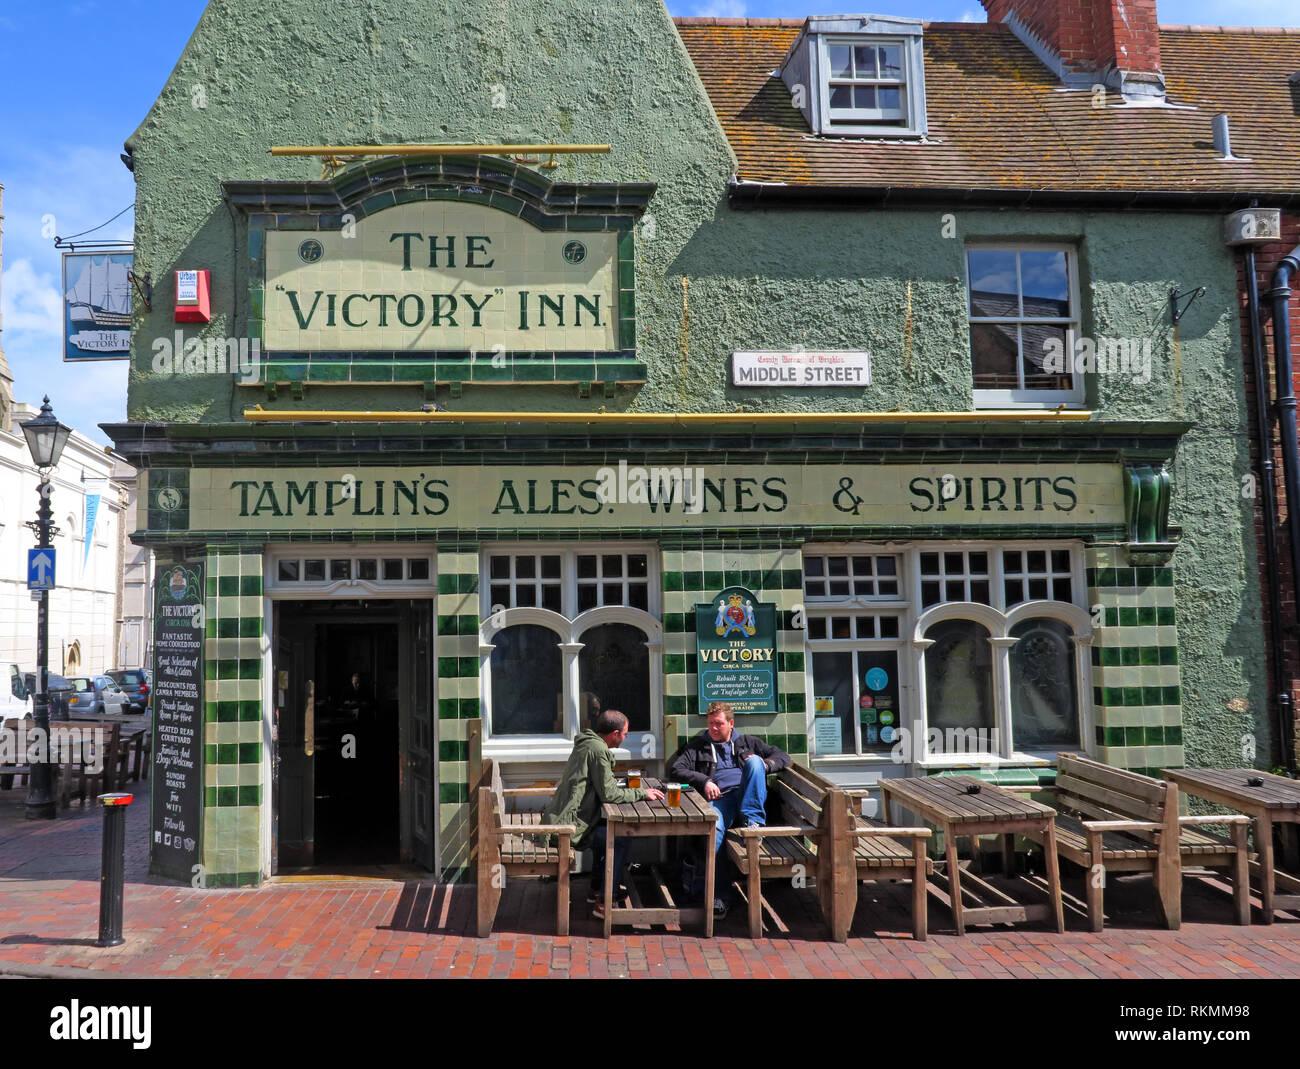 GoTonySmith,HotpixUK,@HotpixUK,South East England,England,seaside,English,UK,GB,coast,coastal,town,summer,seaside resort,resort,Brighton and Hove,council,Sussex,tourists,travel,tourism,popular seaside destination,LGBT,LGBTQ,community,lesbian,gay,Victory Inn,green,pub,bar,wines,spirits,front,frontage,door